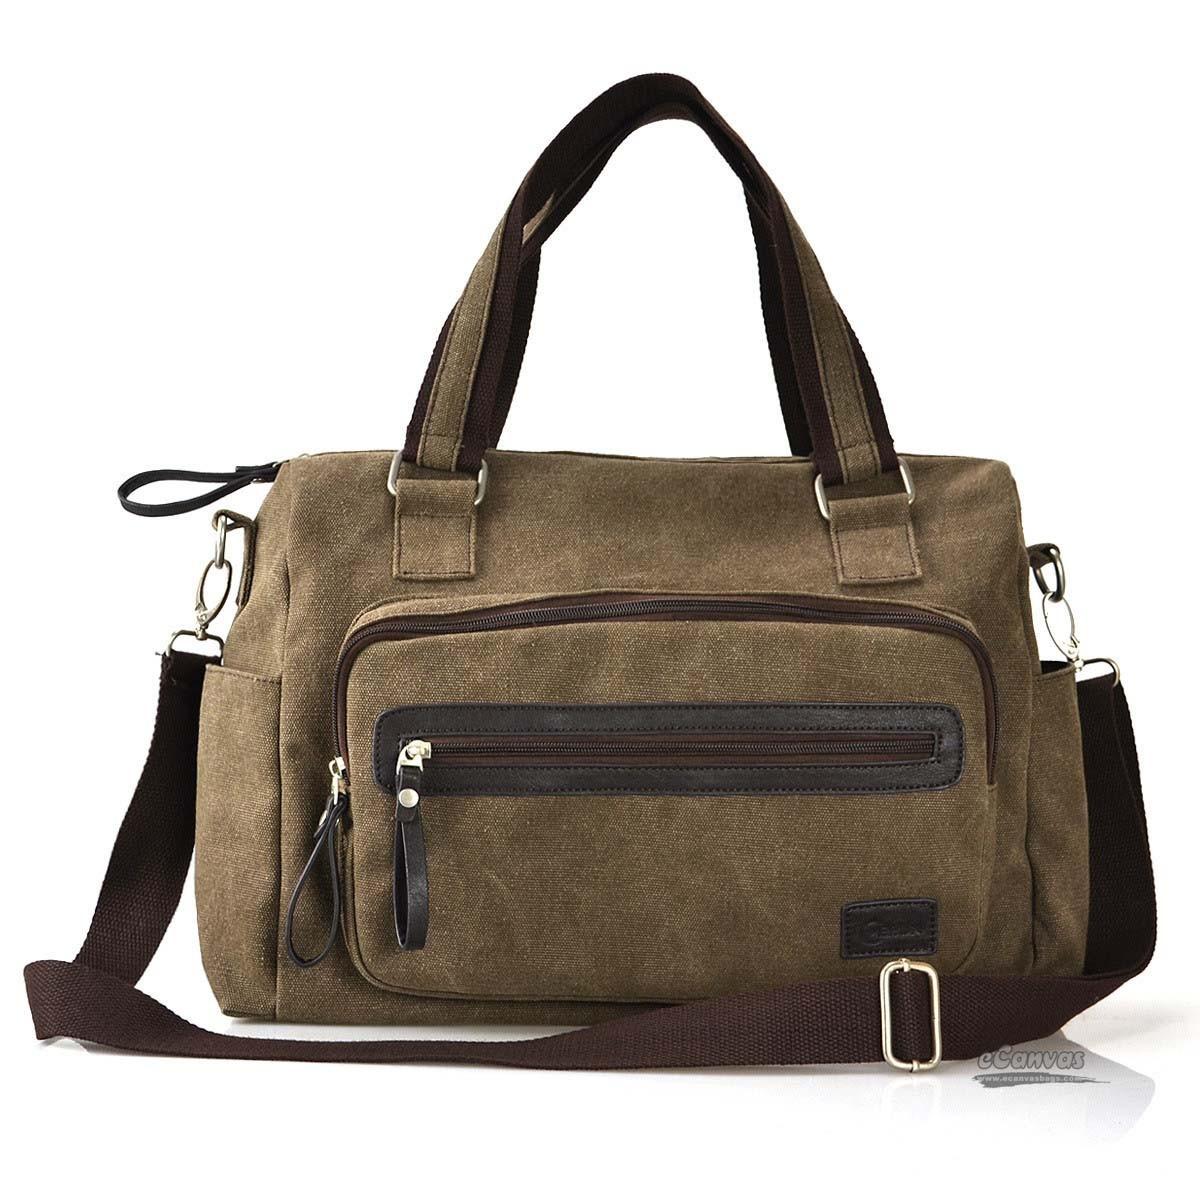 Shoulder Laptop Bag Ladies Laptop Tote156 Inch Laptop Tote Bag Work Totes Large Shoulder Bags